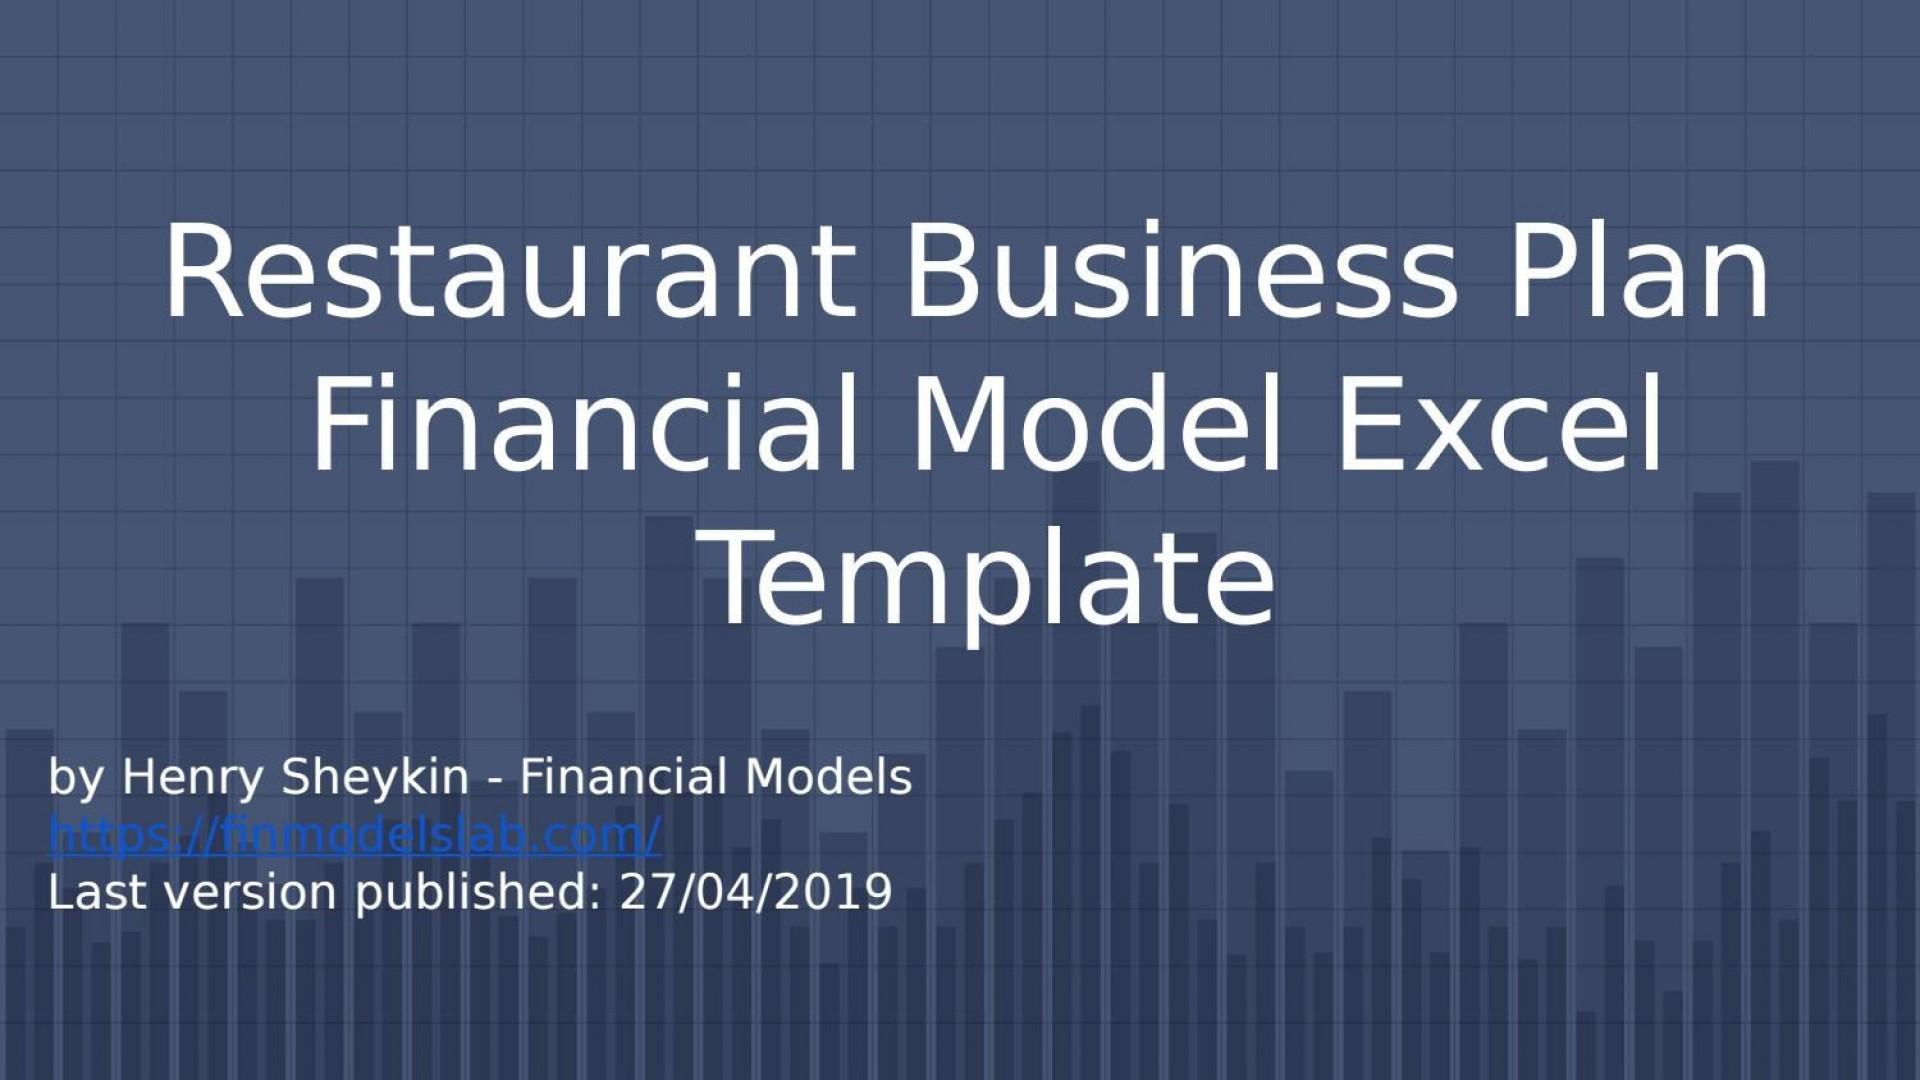 006 Fantastic Restaurant Busines Plan Template Excel Photo  Free1920